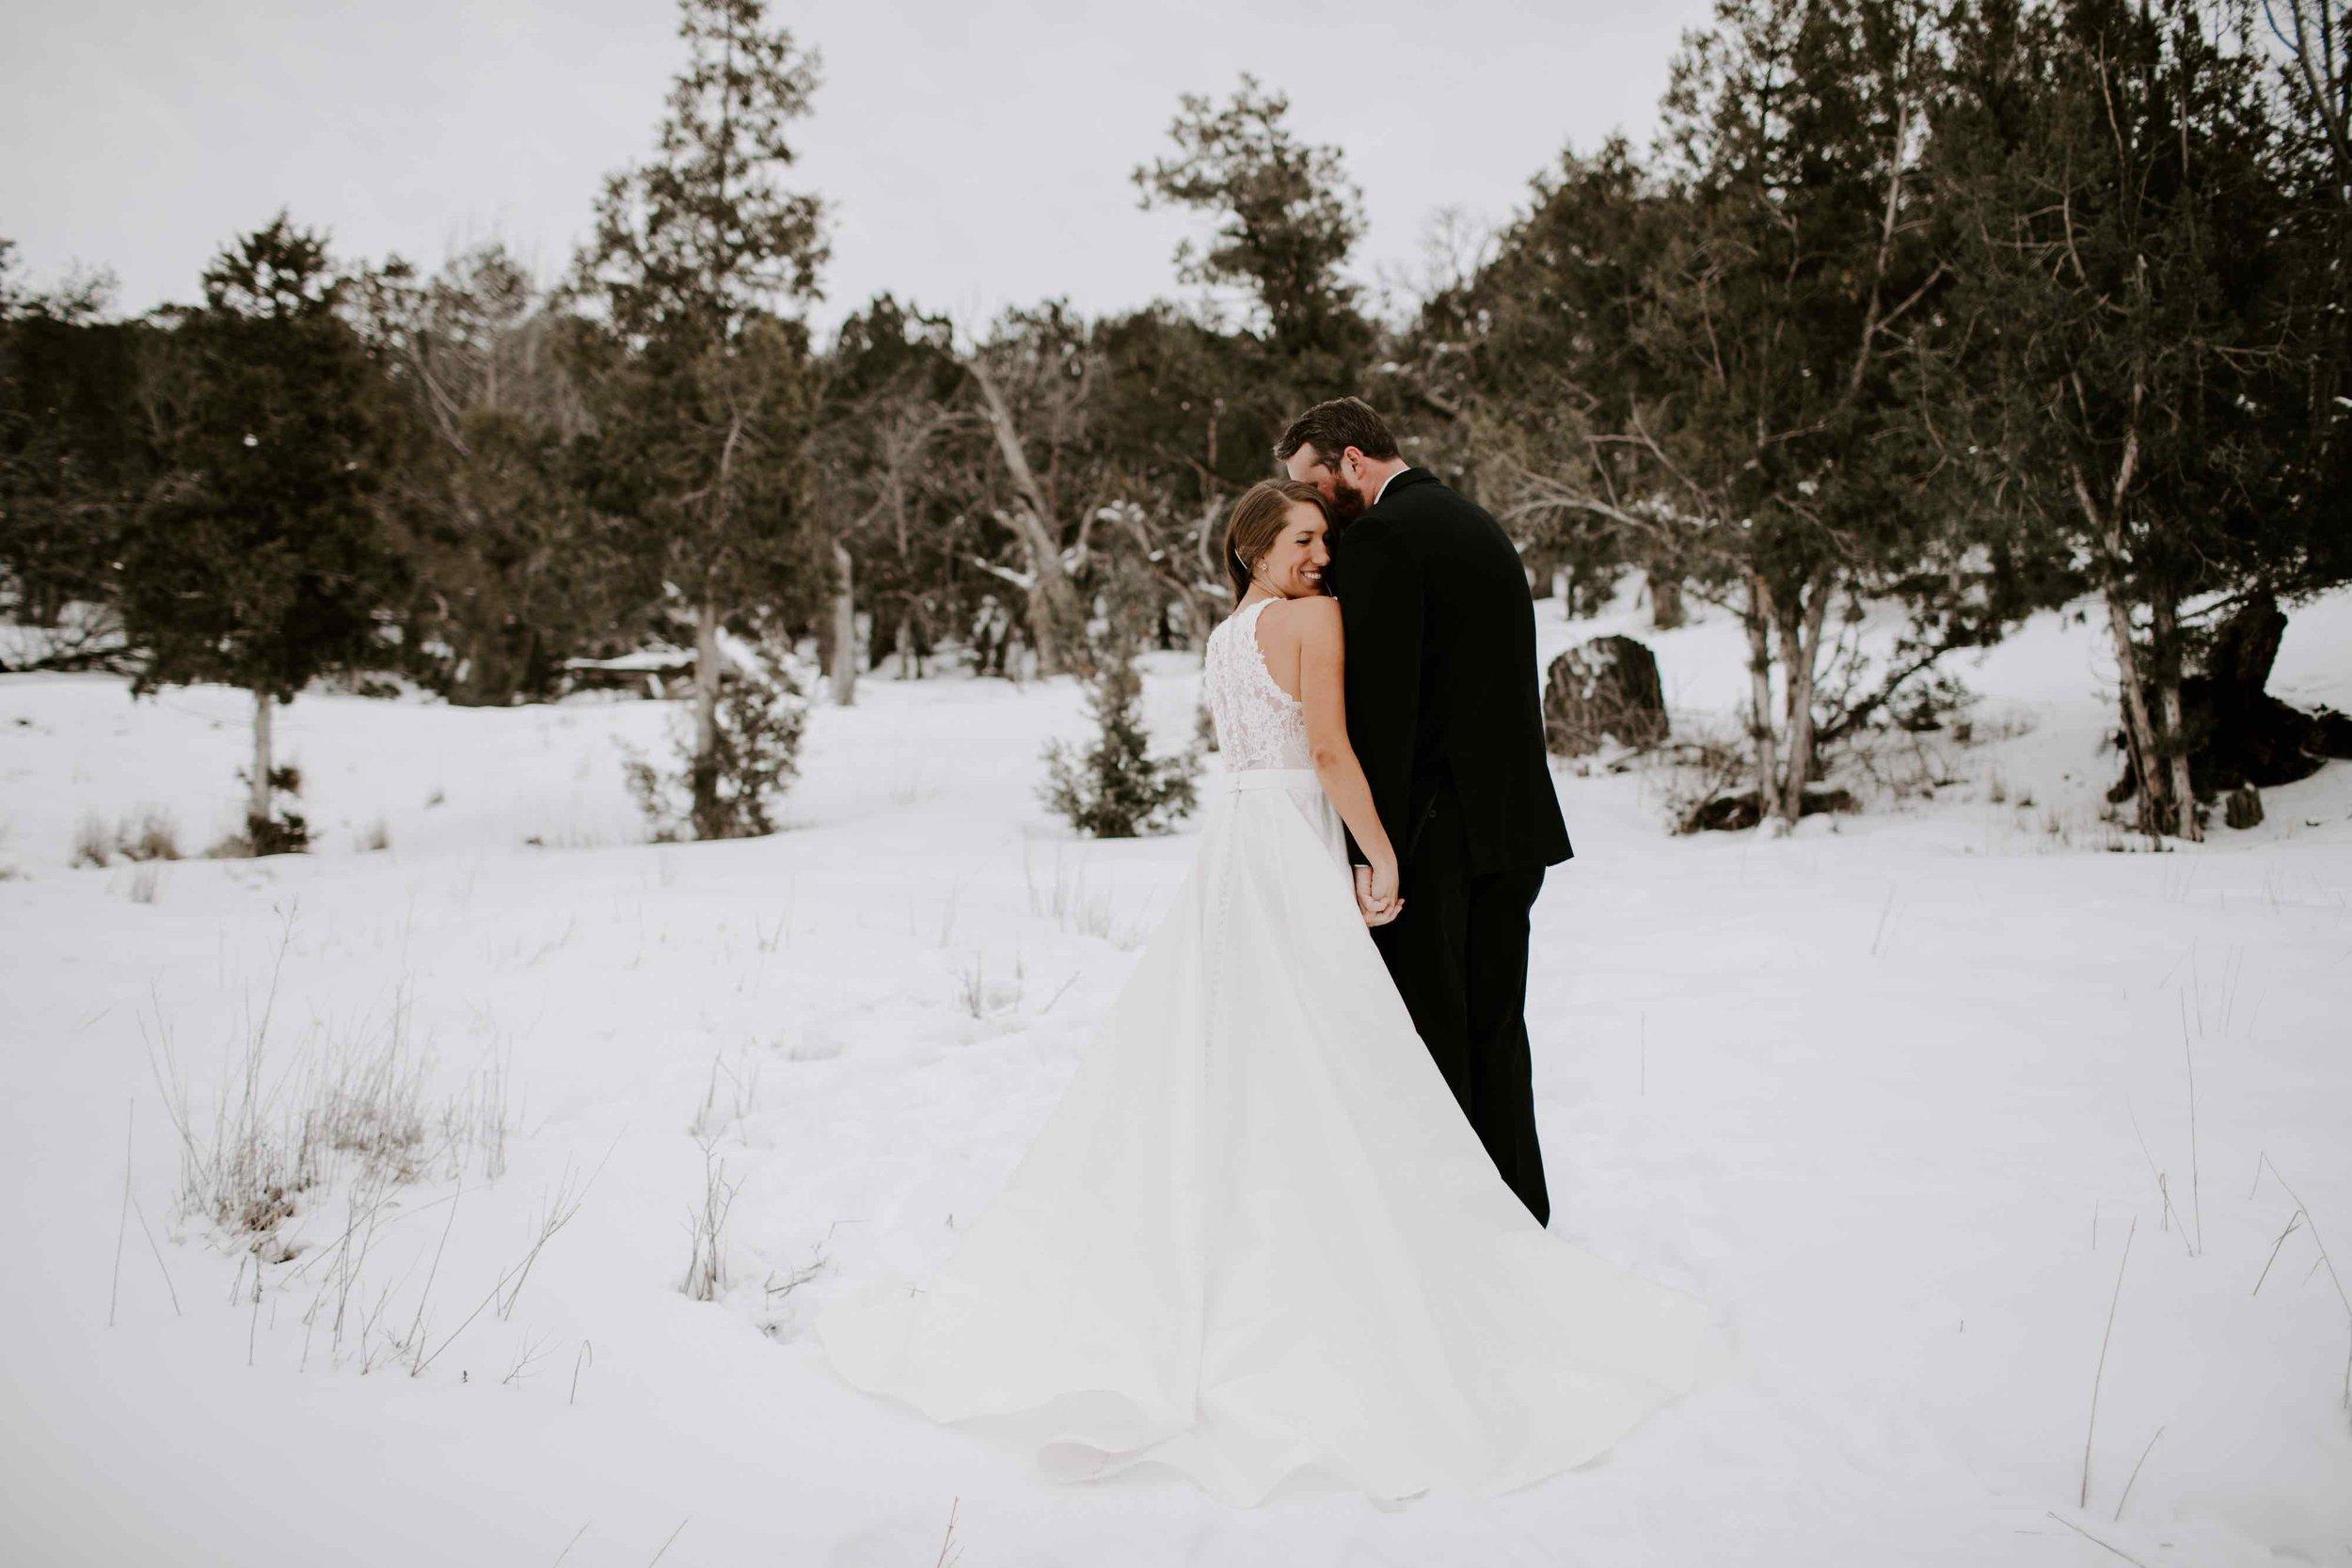 Kisa Conrad Favorites-0041-colorado-wedding-photographer-denver-springs-vailhotel-glenwood-springs-colorado-wedding-photographer.jpeg